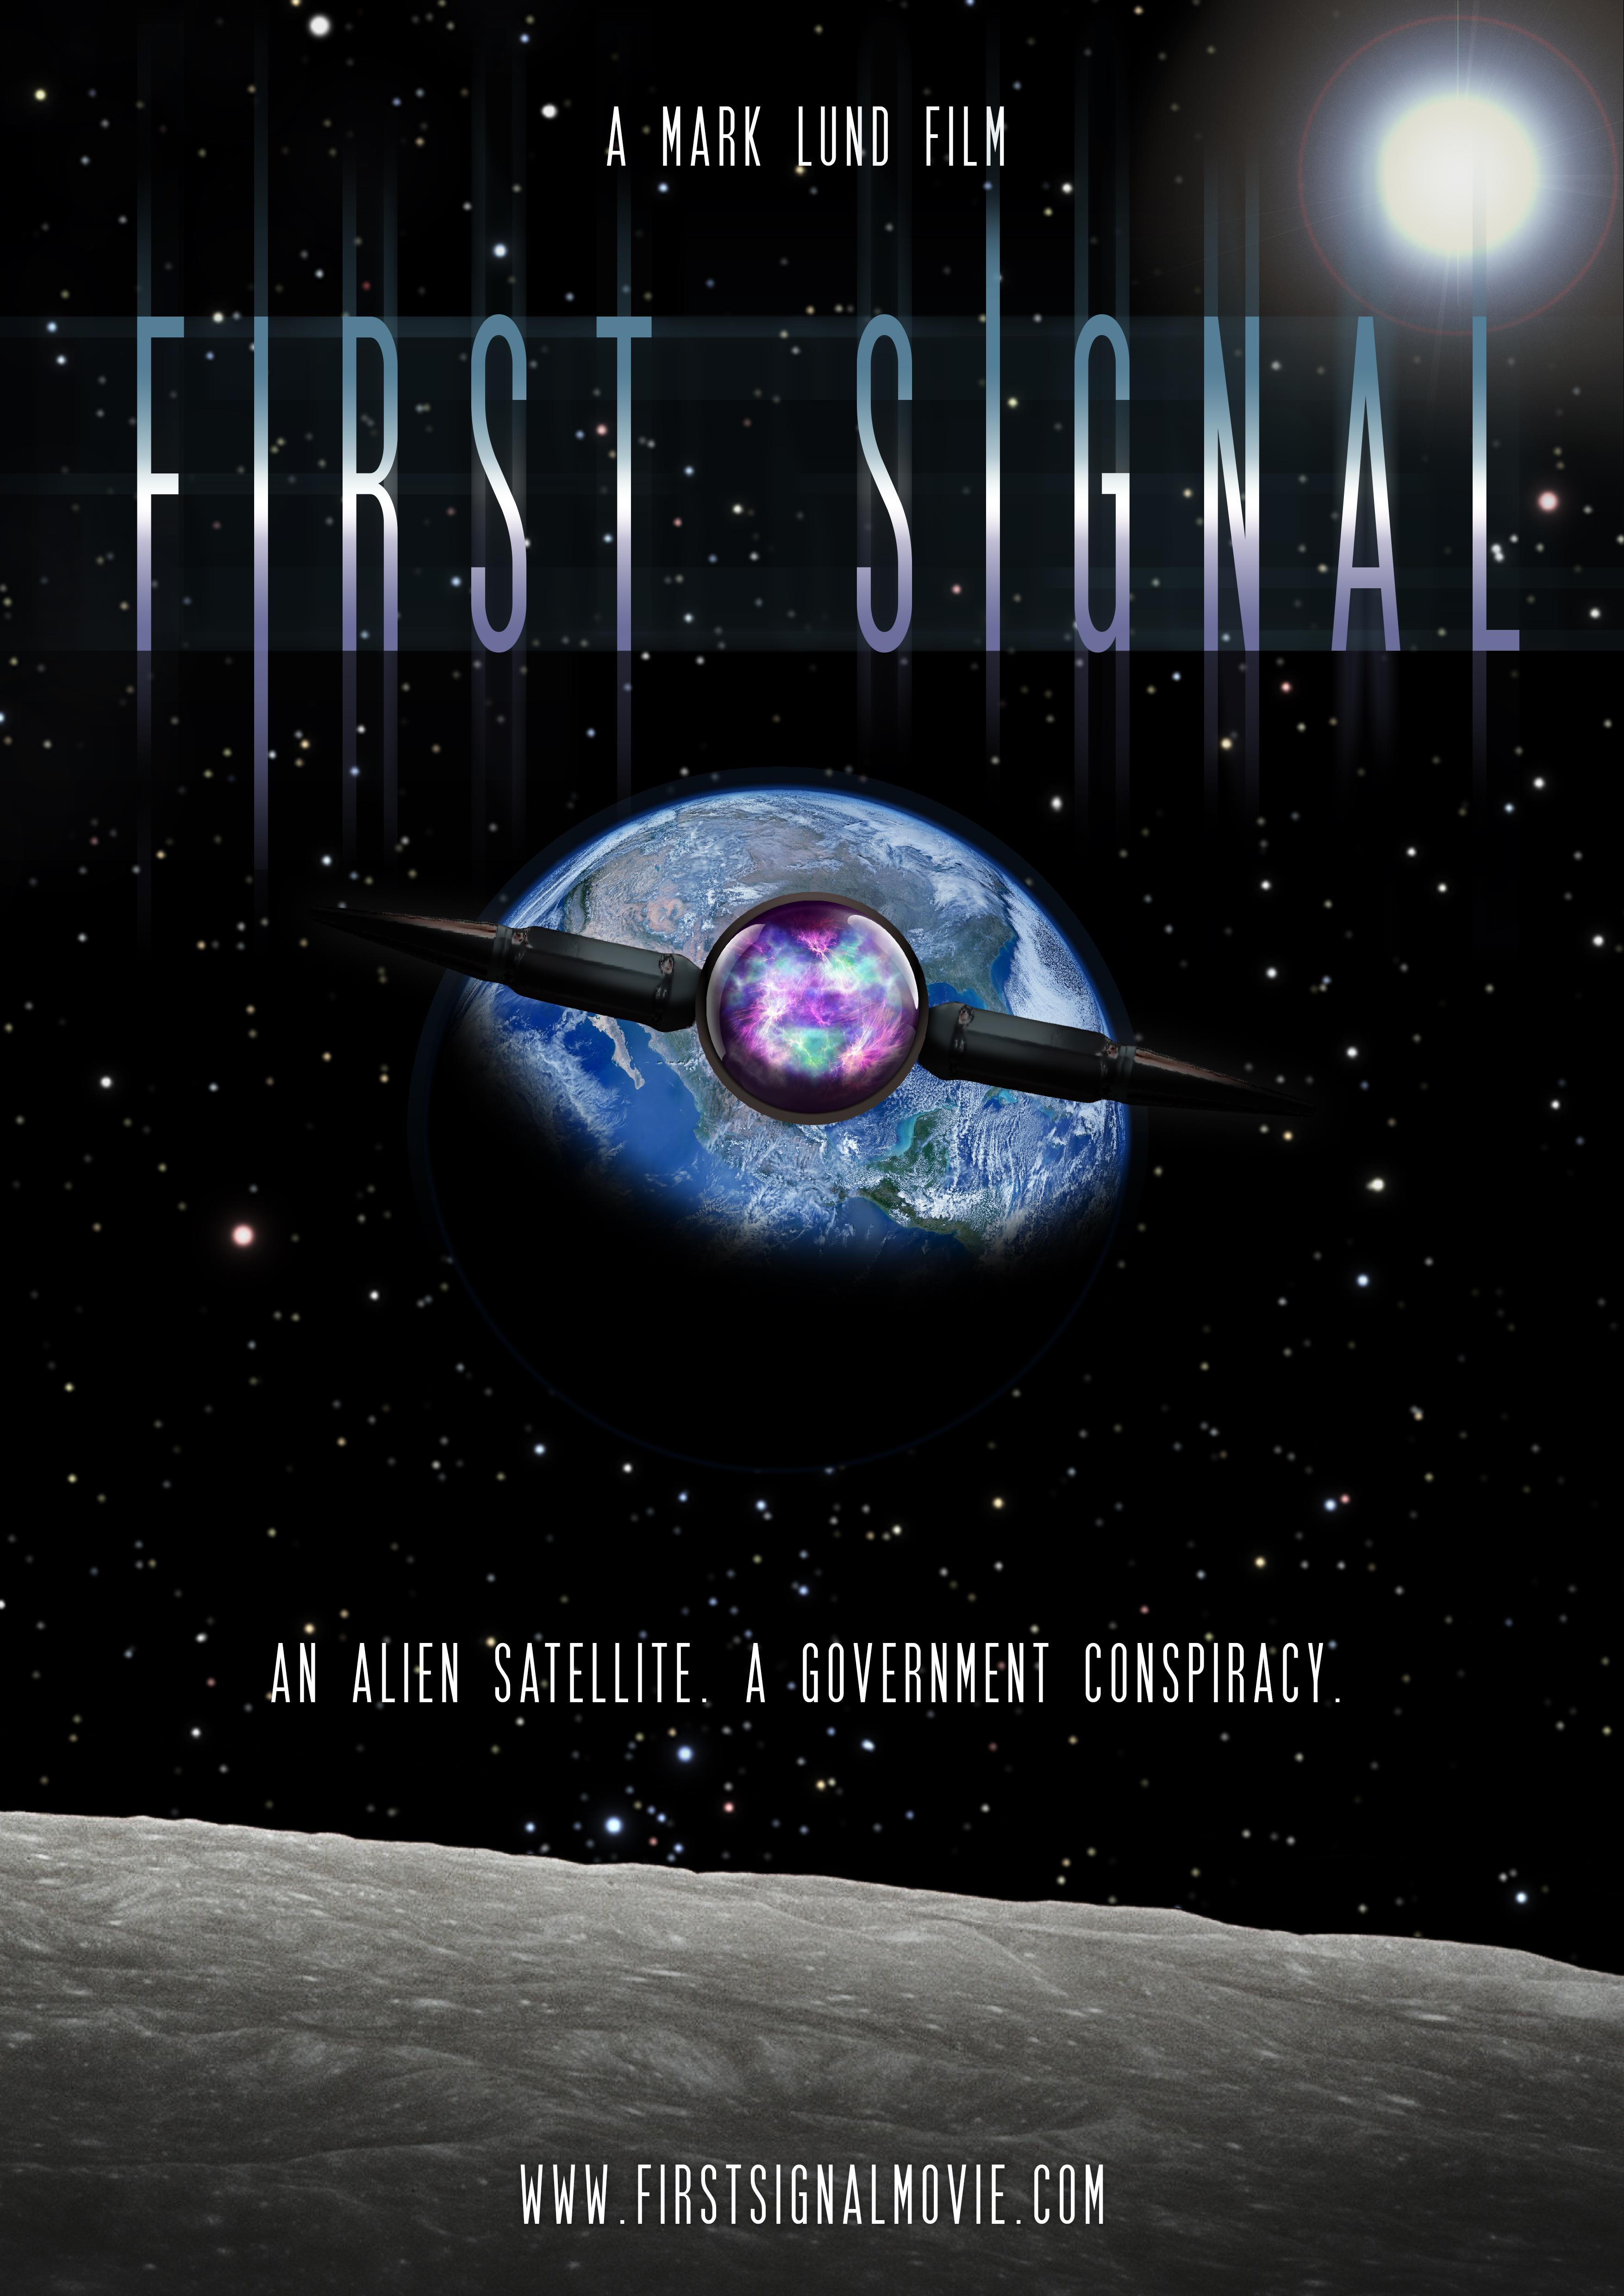 FIRST-SIGNAL-POSTER-V11.jpg